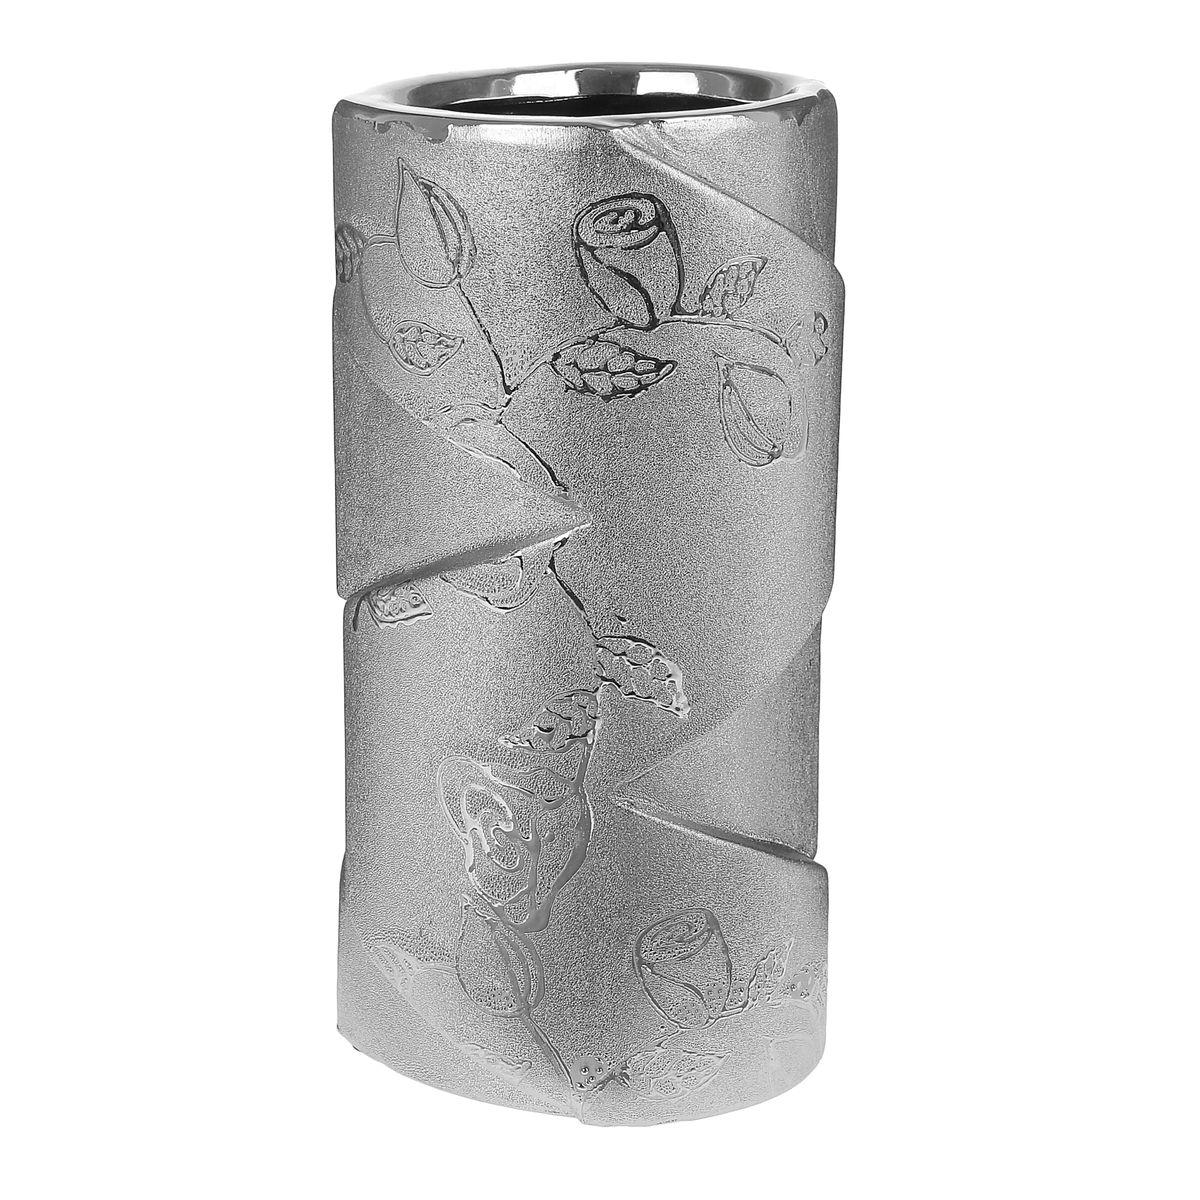 Ваза керамика серебрянная роза 18*9,5 см 863633863633Керамика